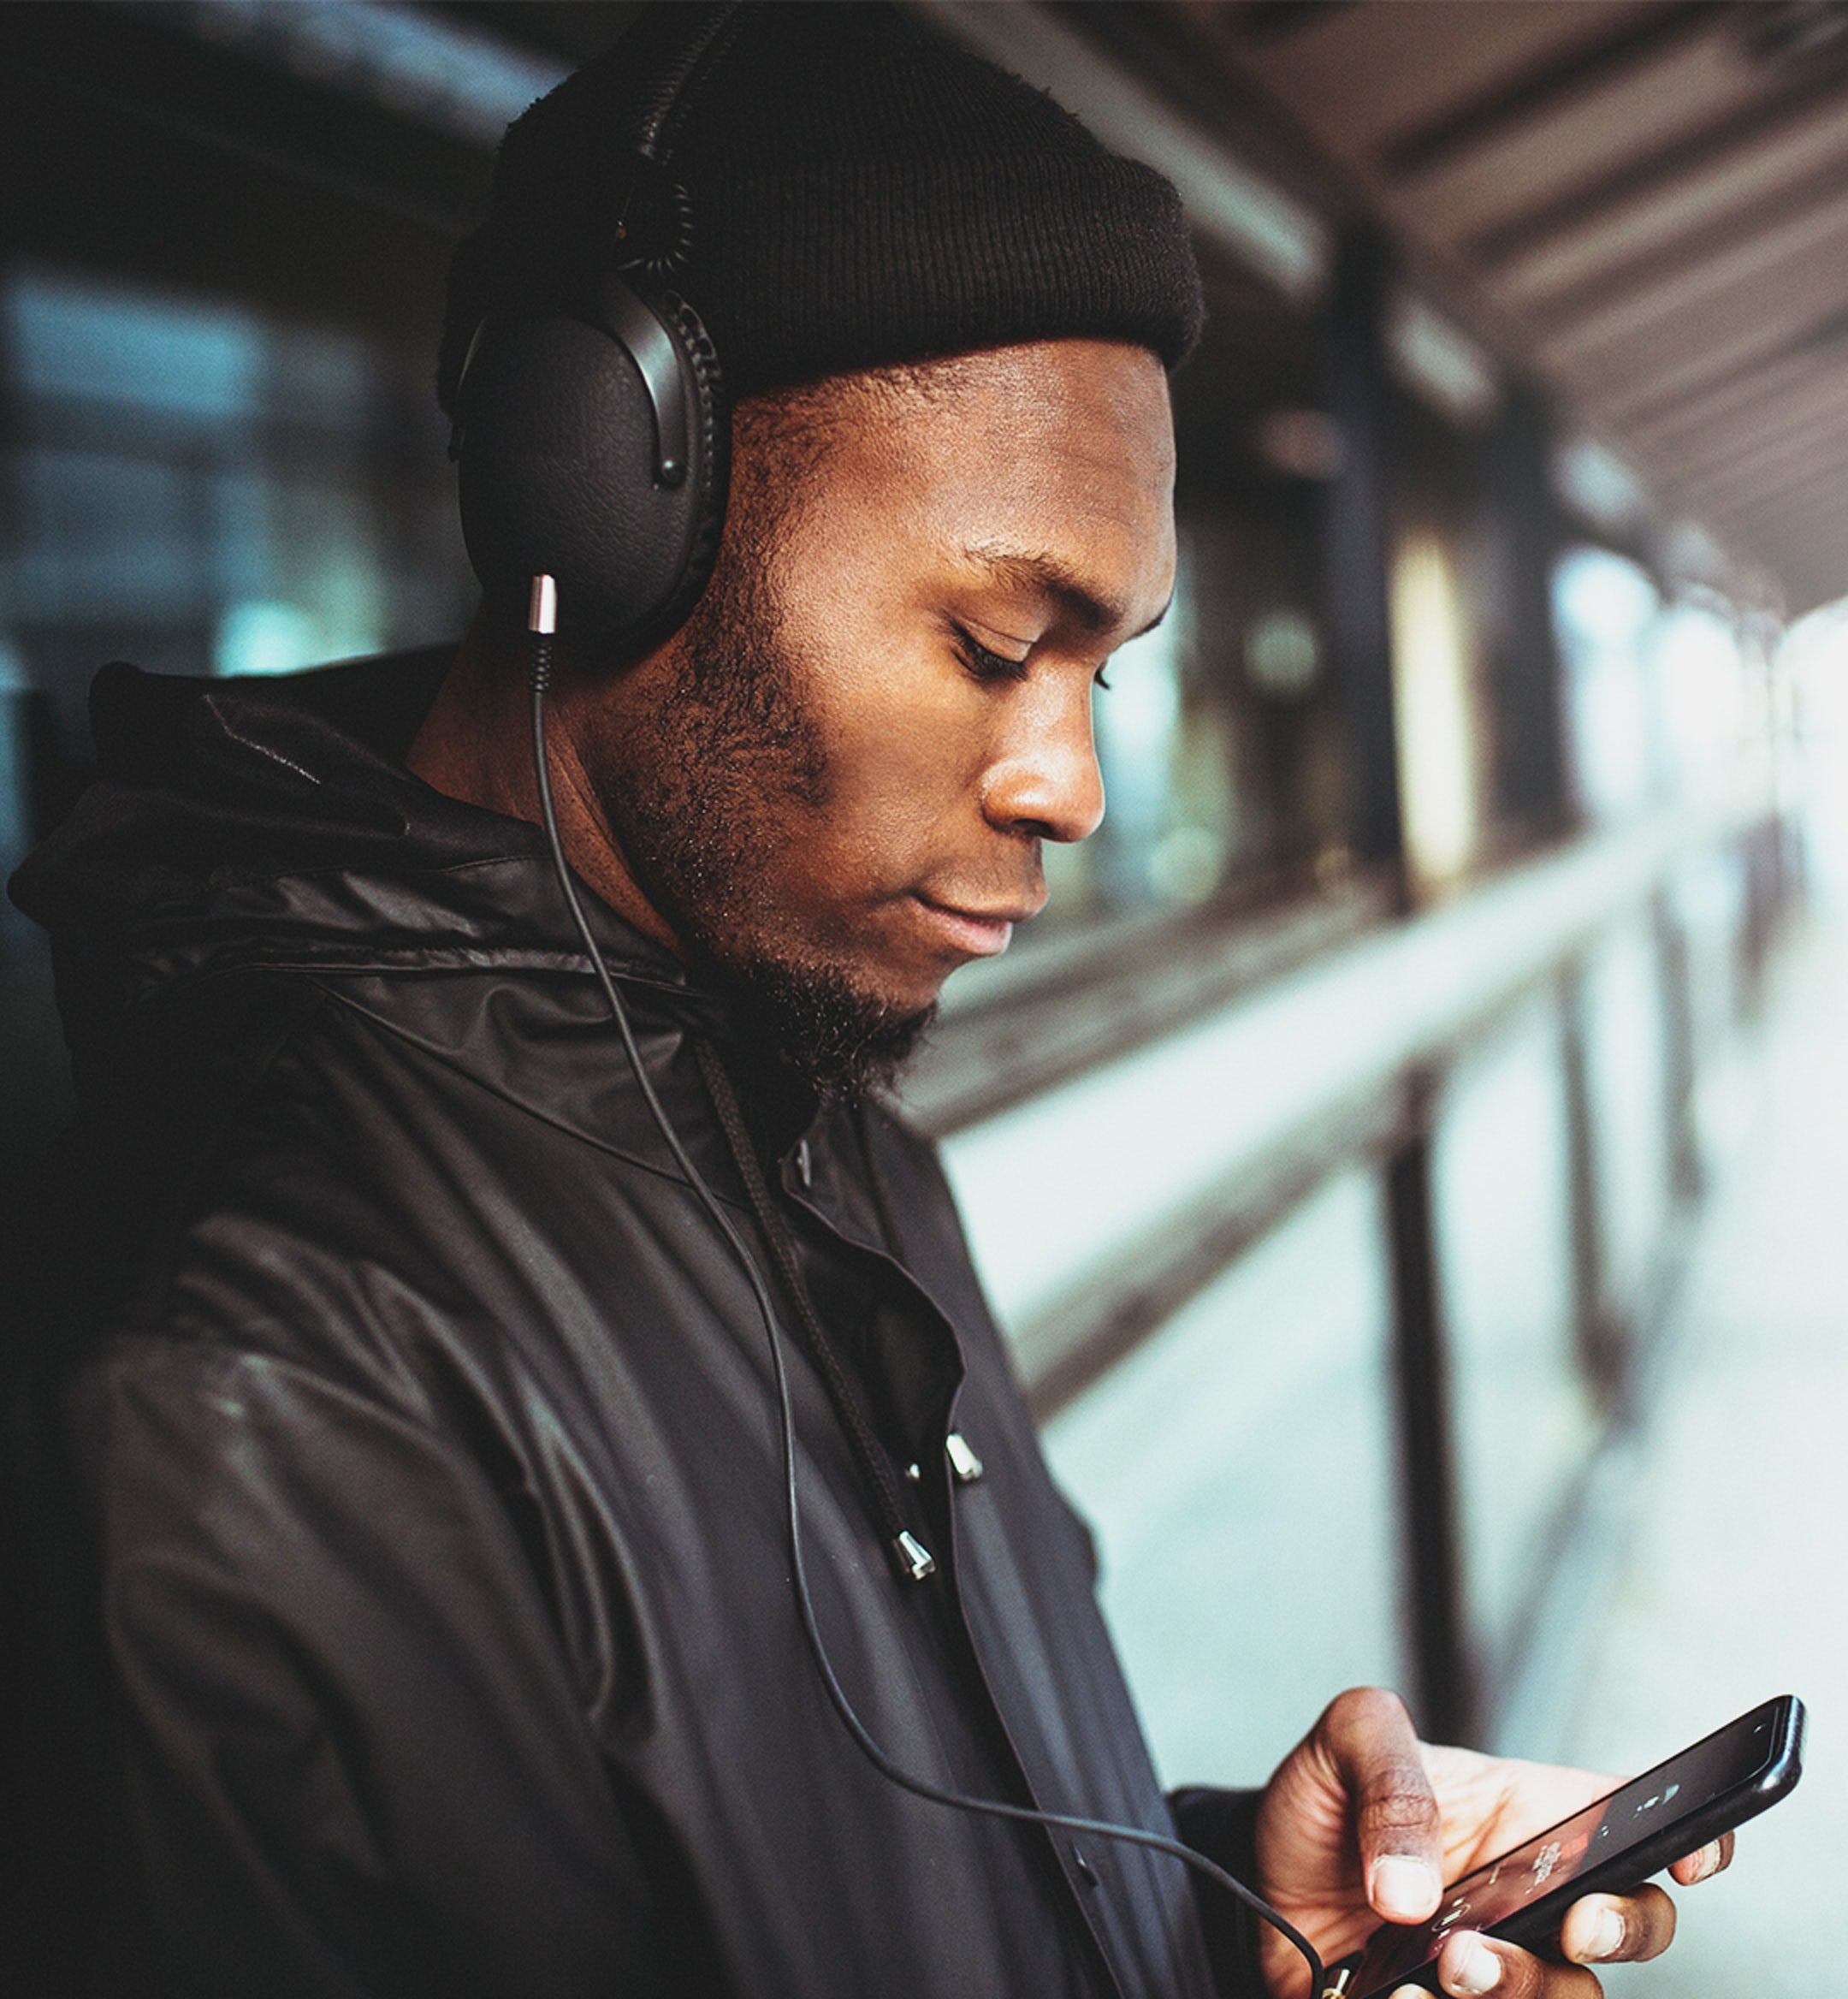 amazon headphones overear one37pm mobile